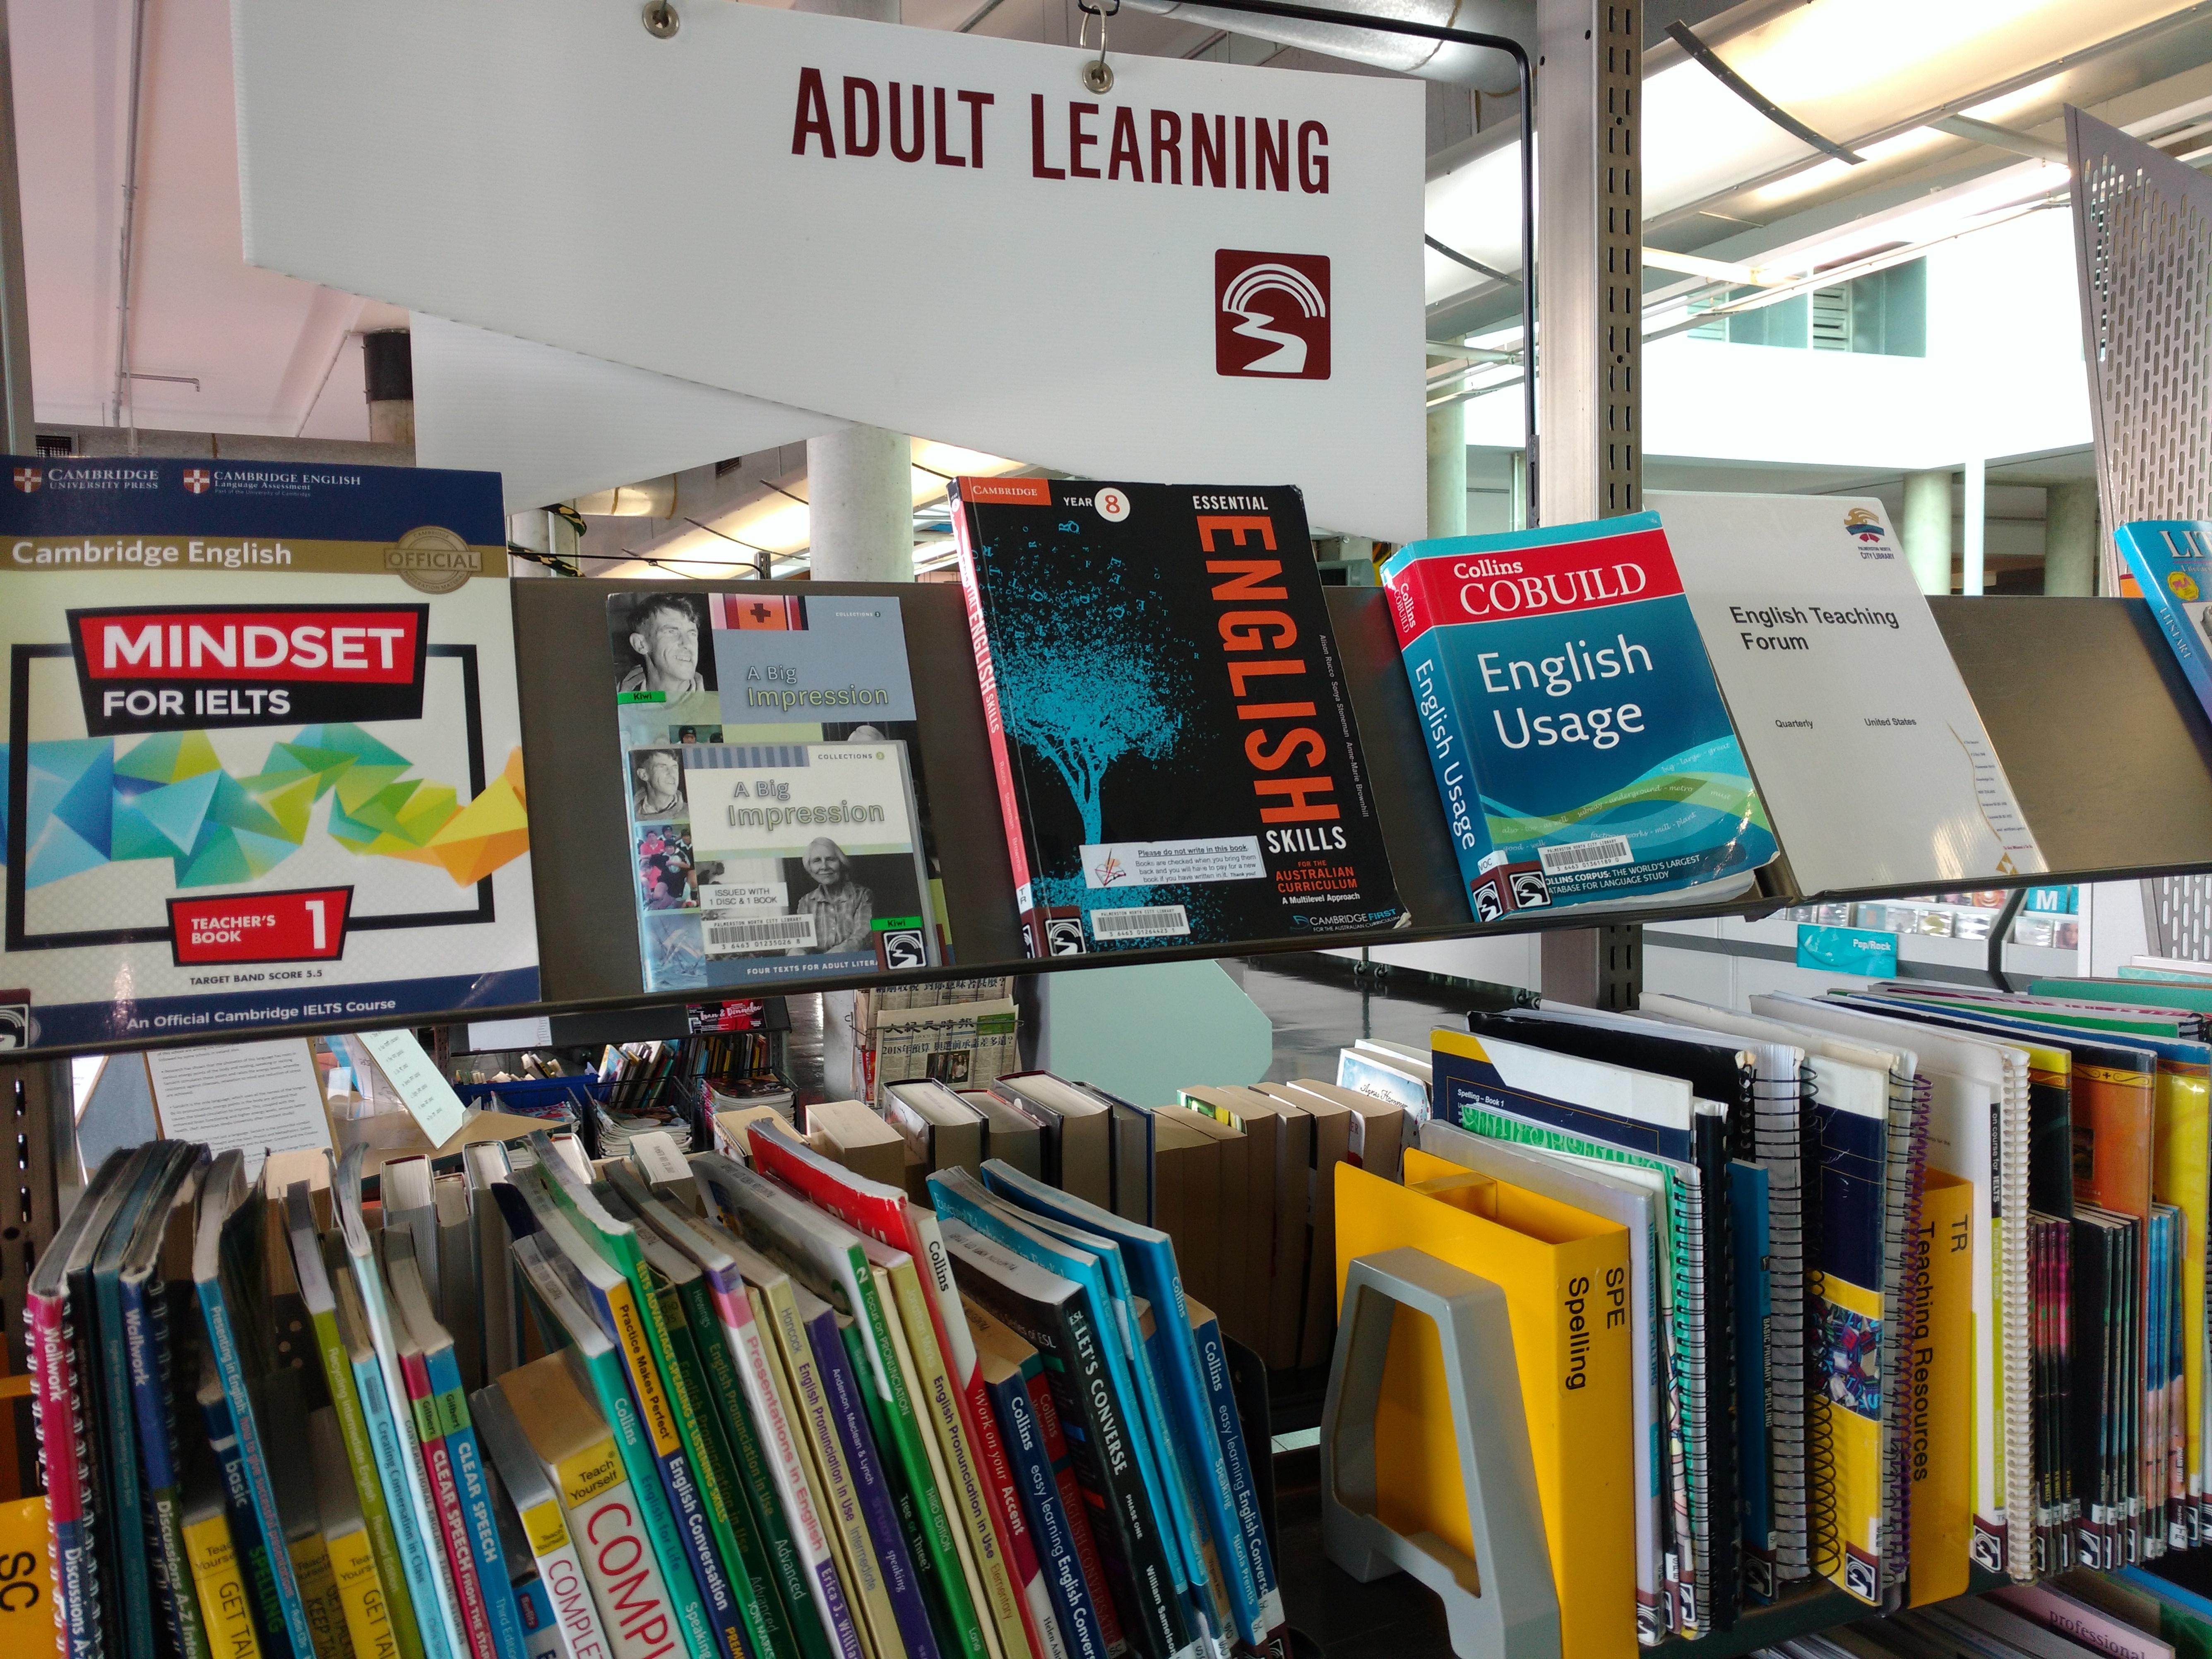 Adult-Learning-LR.jpg?mtime=20180906163903#asset:9884